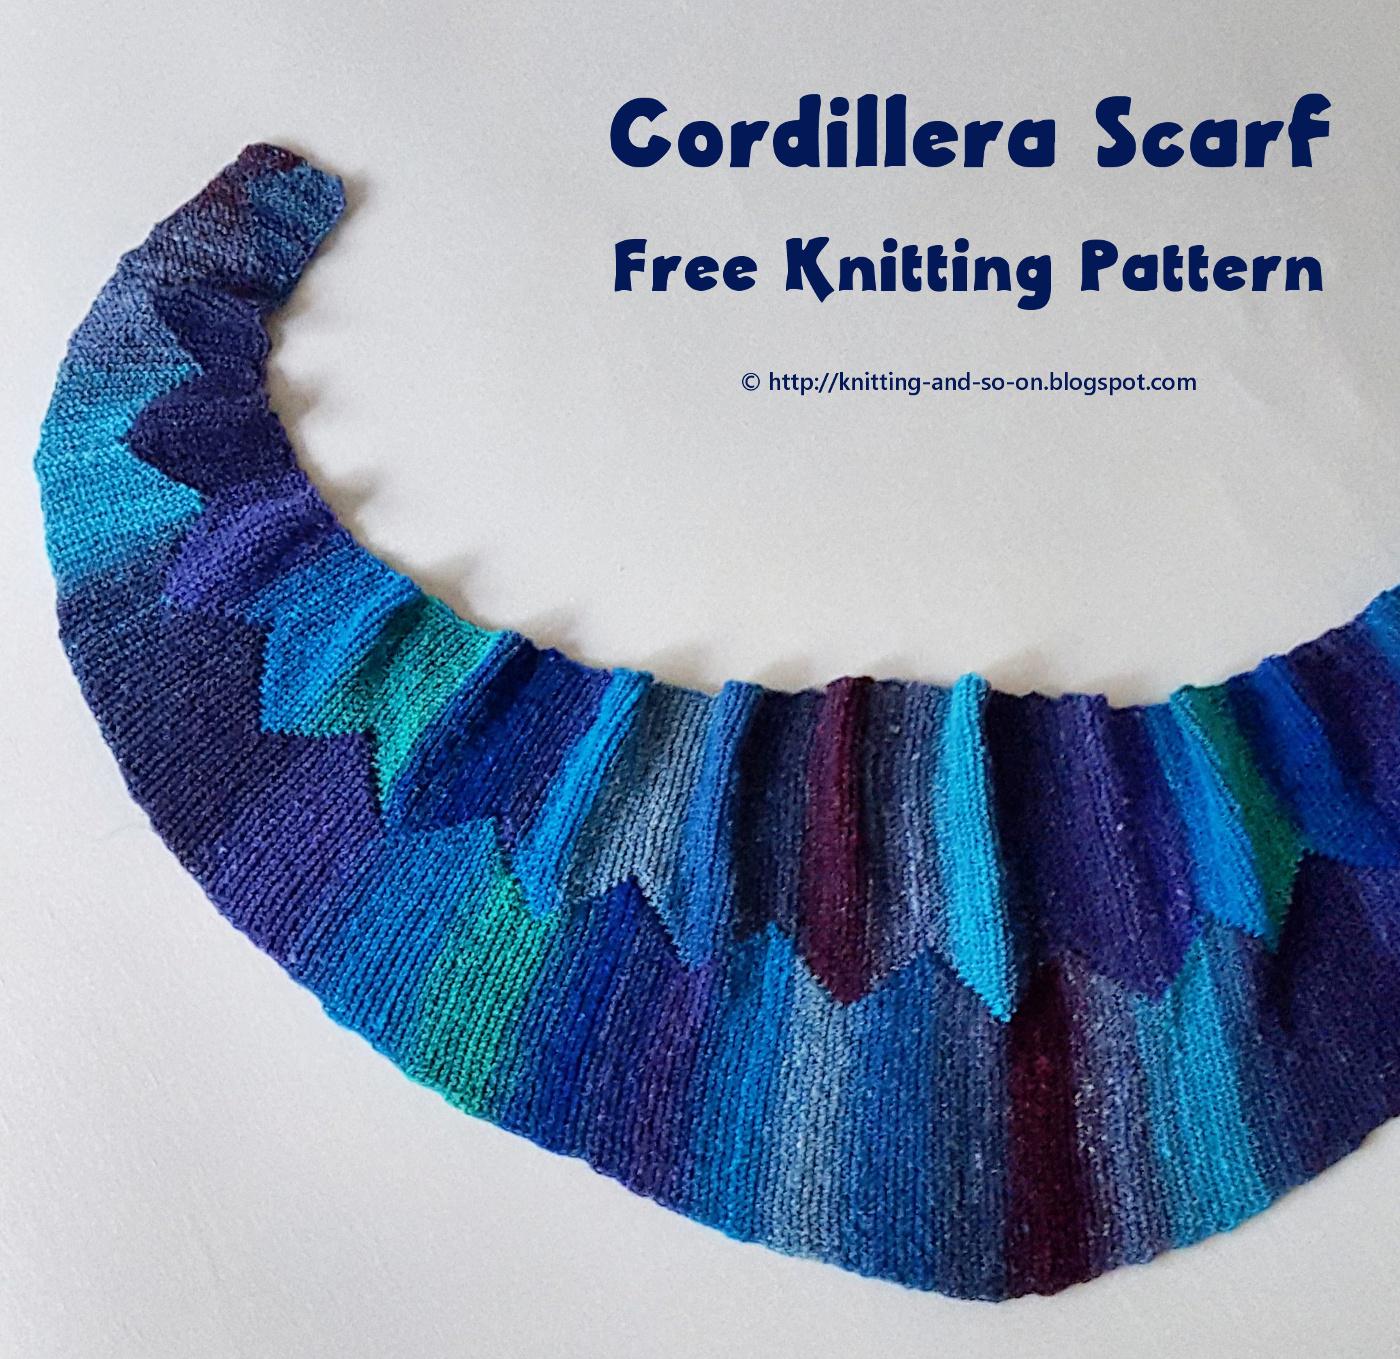 Knitting Pattern Notation : Knitting and so on: Cordillera Scarf